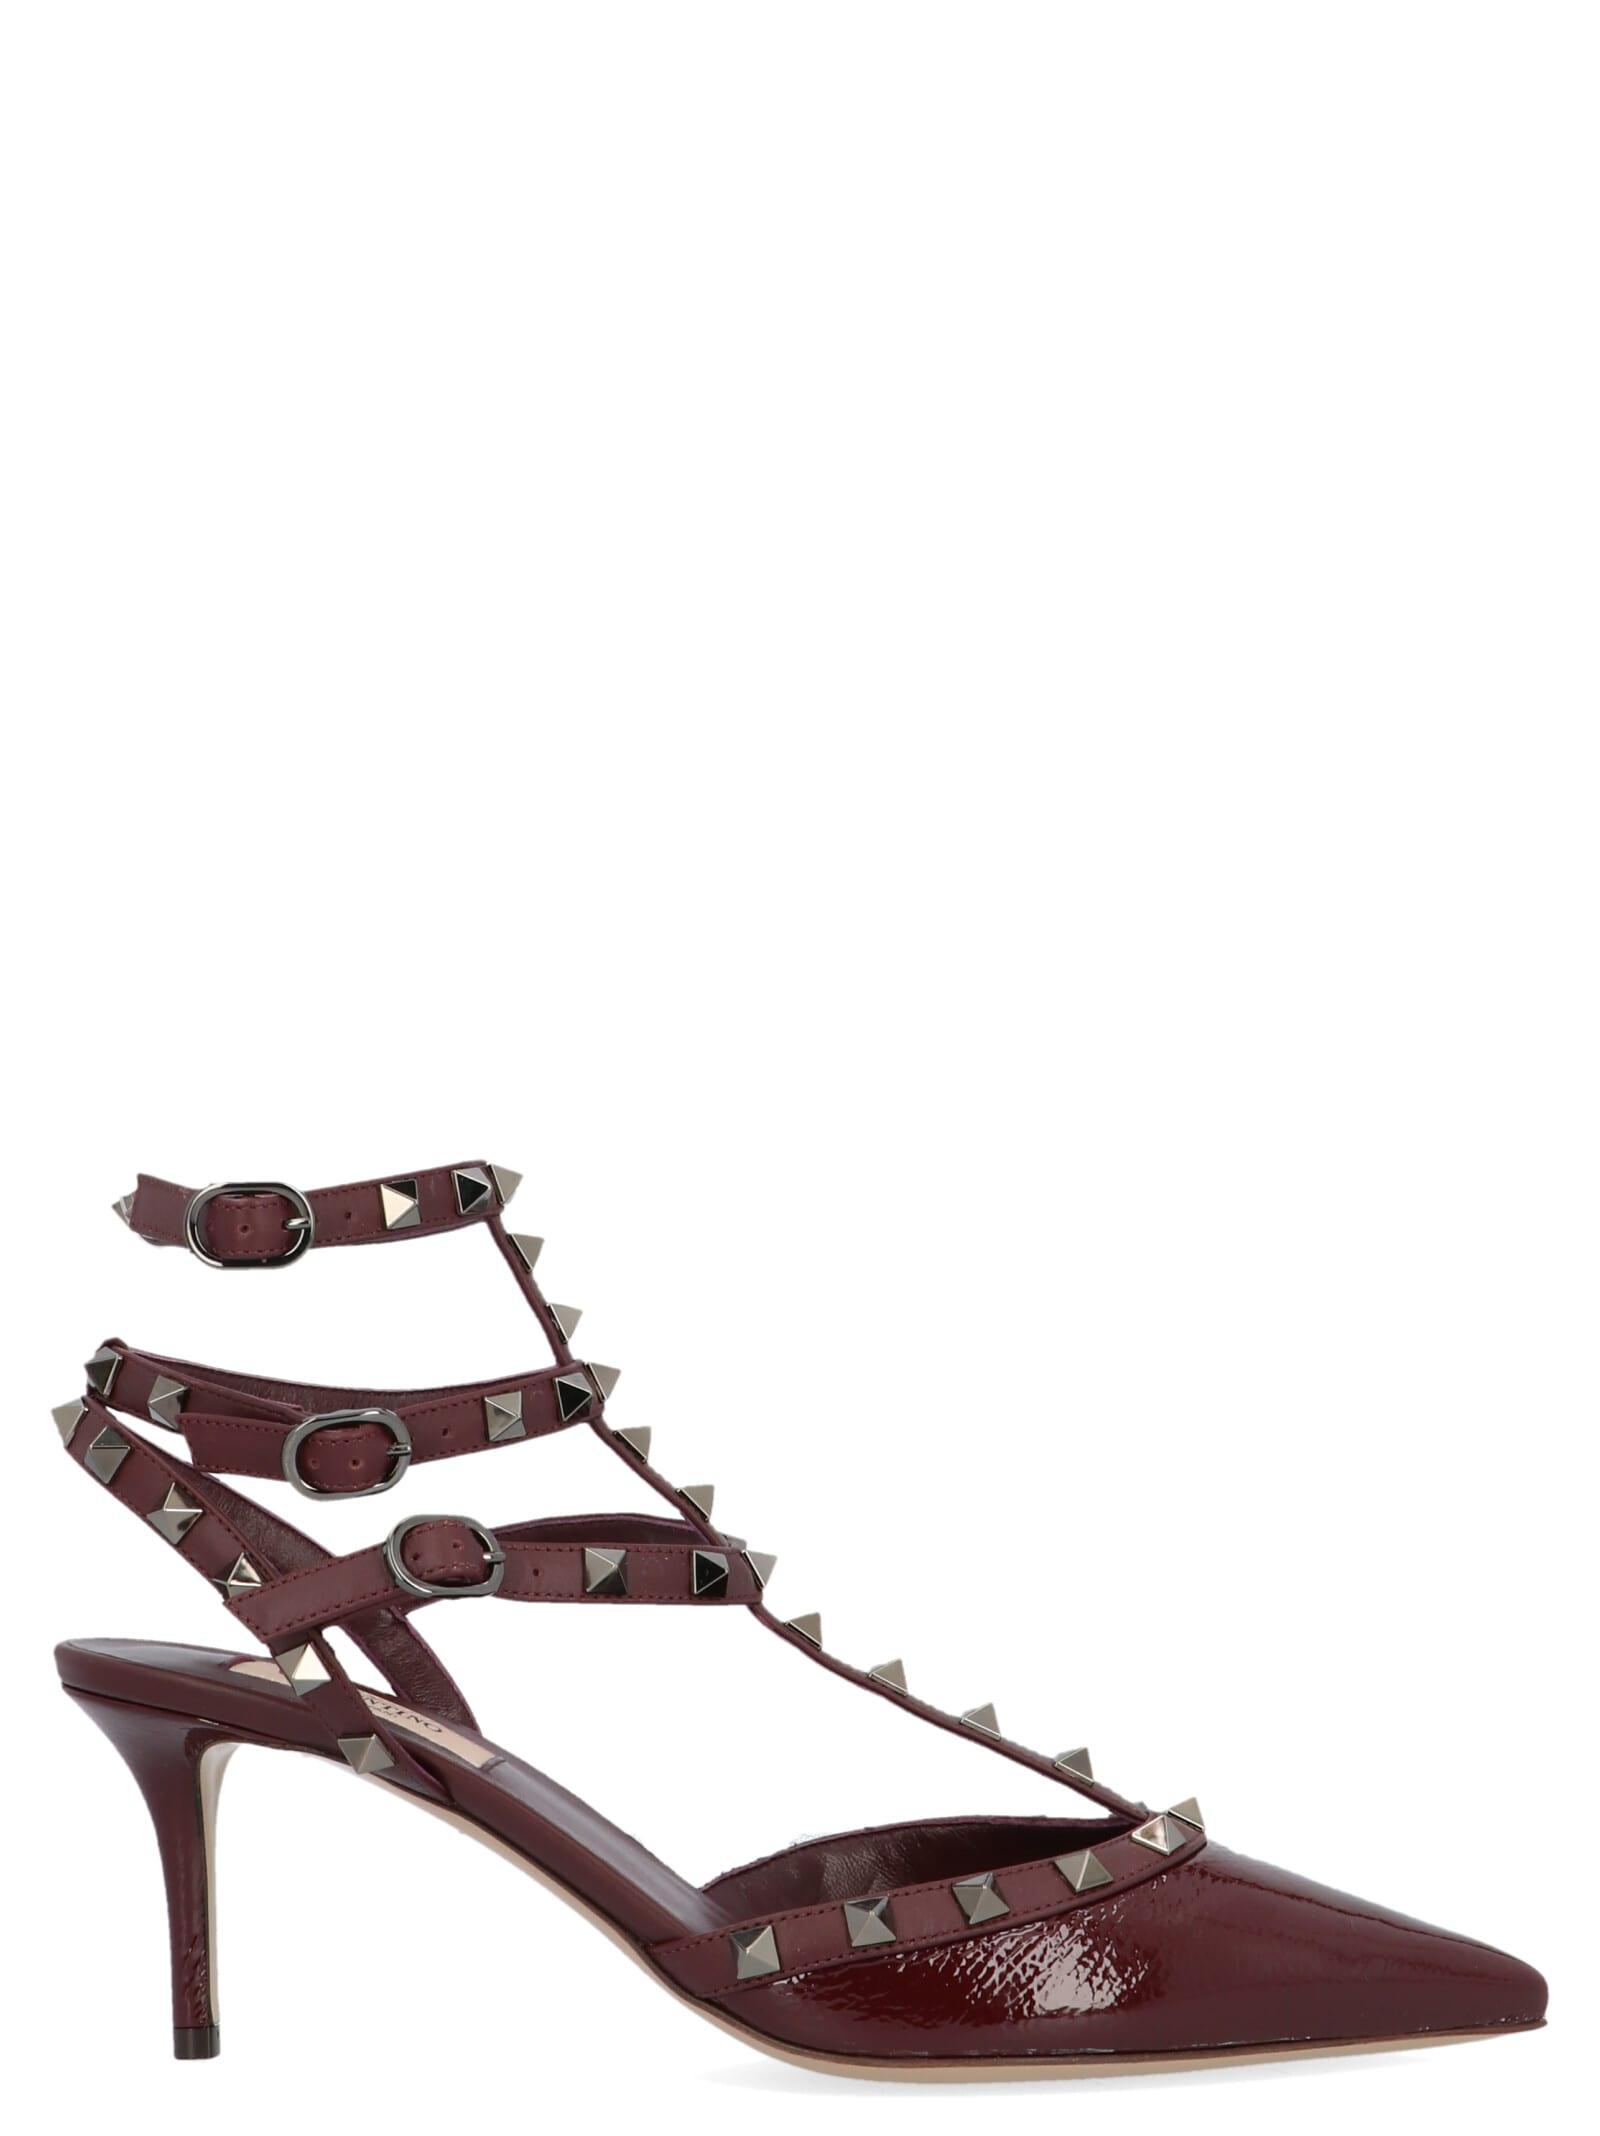 Valentino Garavani Rockstud Shoes In